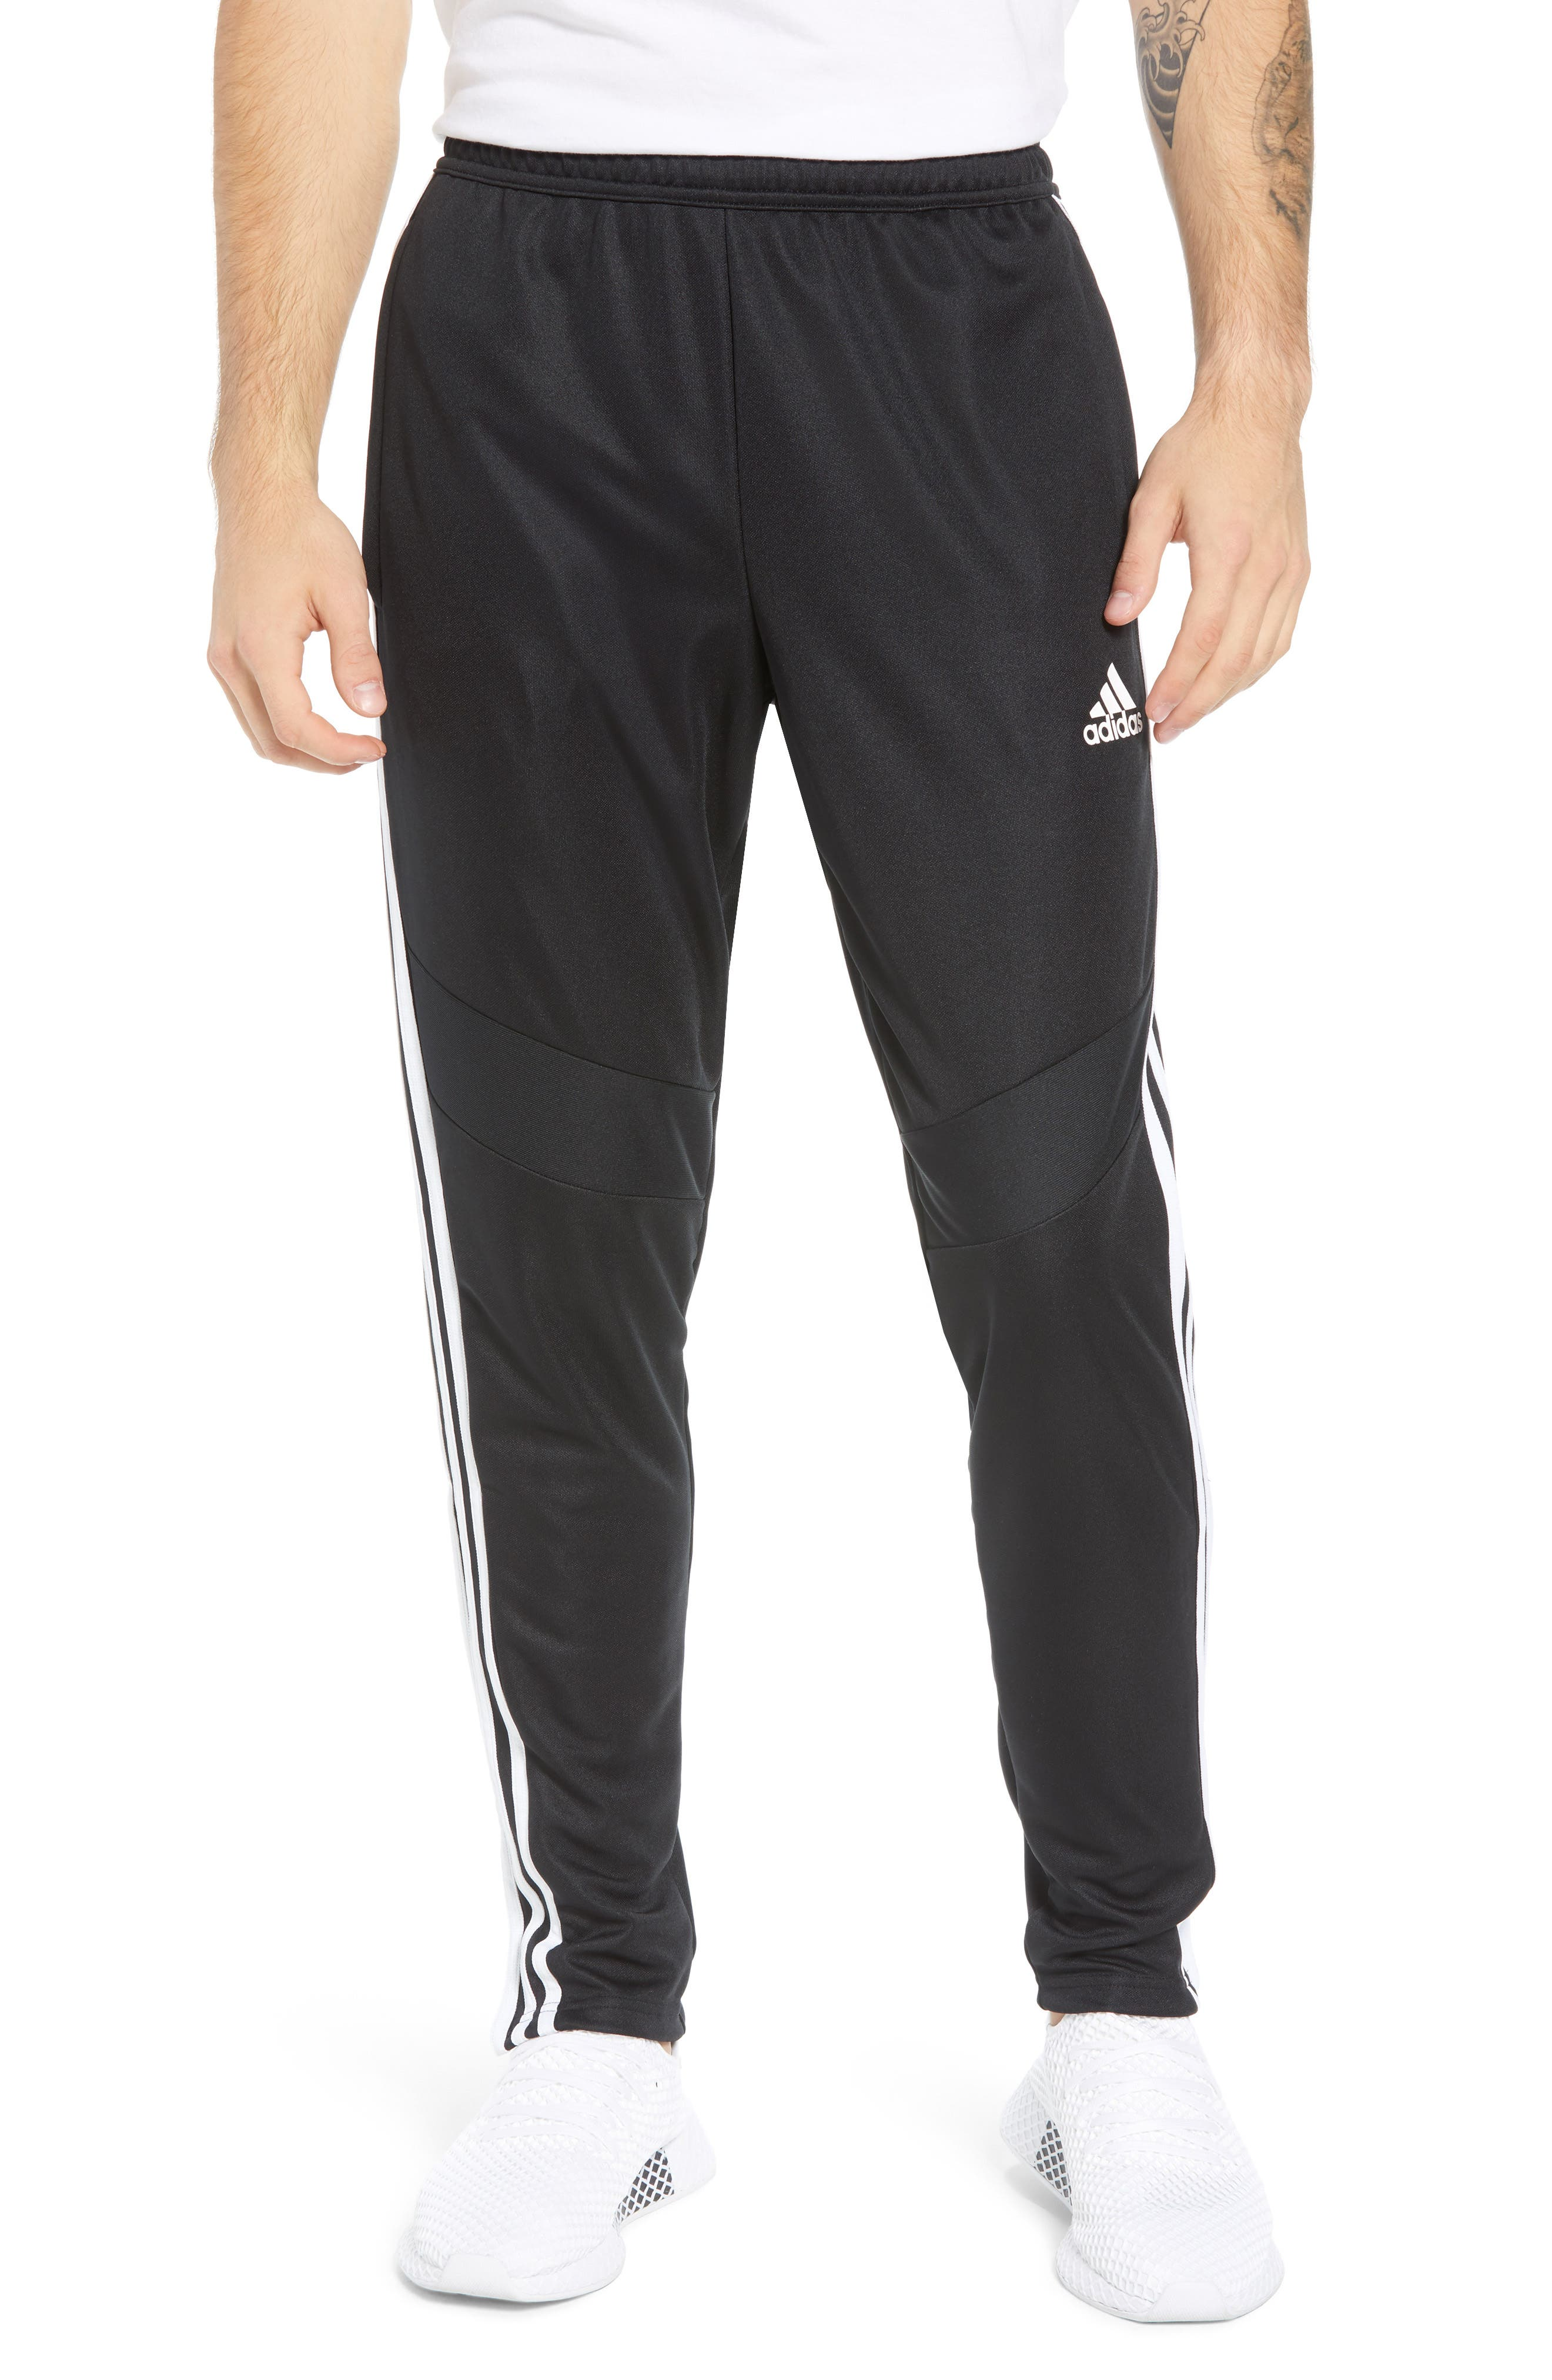 Men's adidas Clothing | Nordstrom